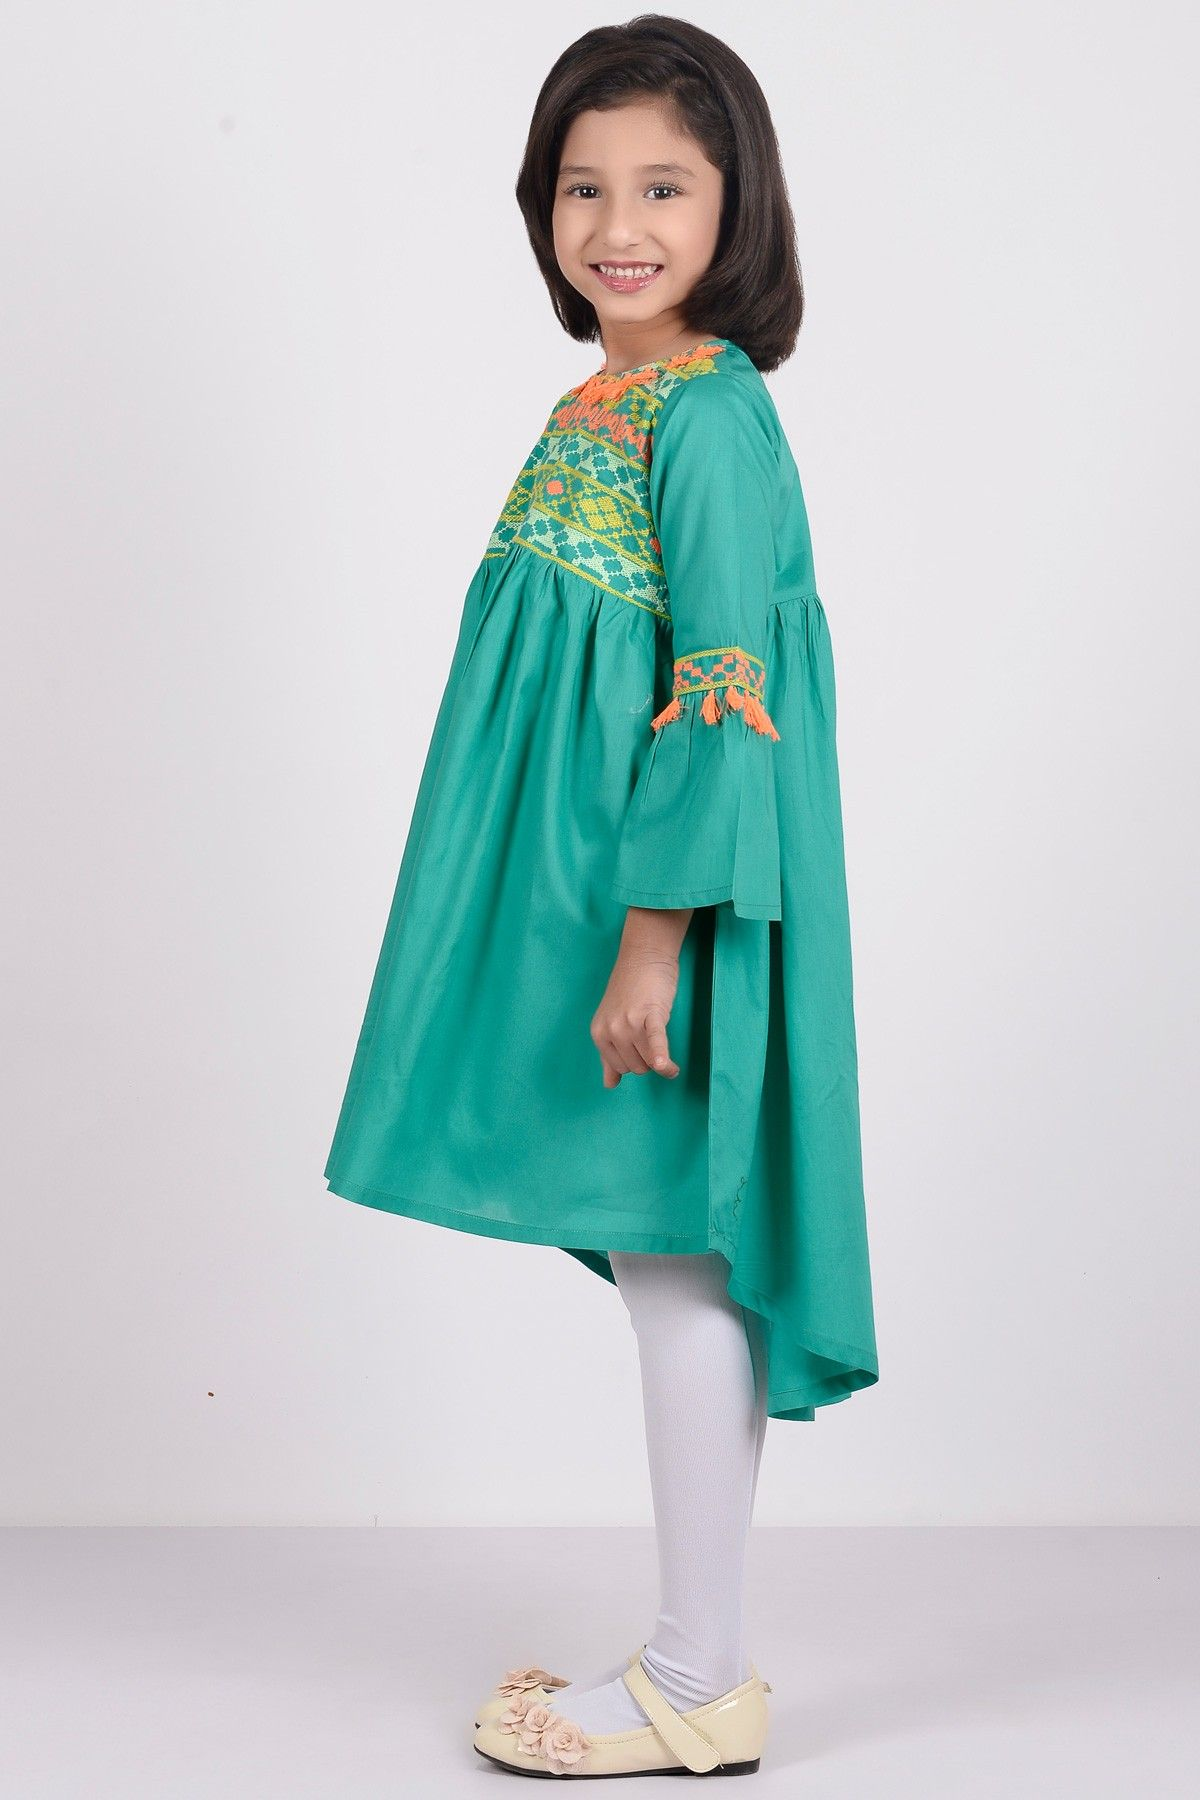 Khaadi - Embroidered Dress - Kids   Khadi   Pinterest   Girls ...